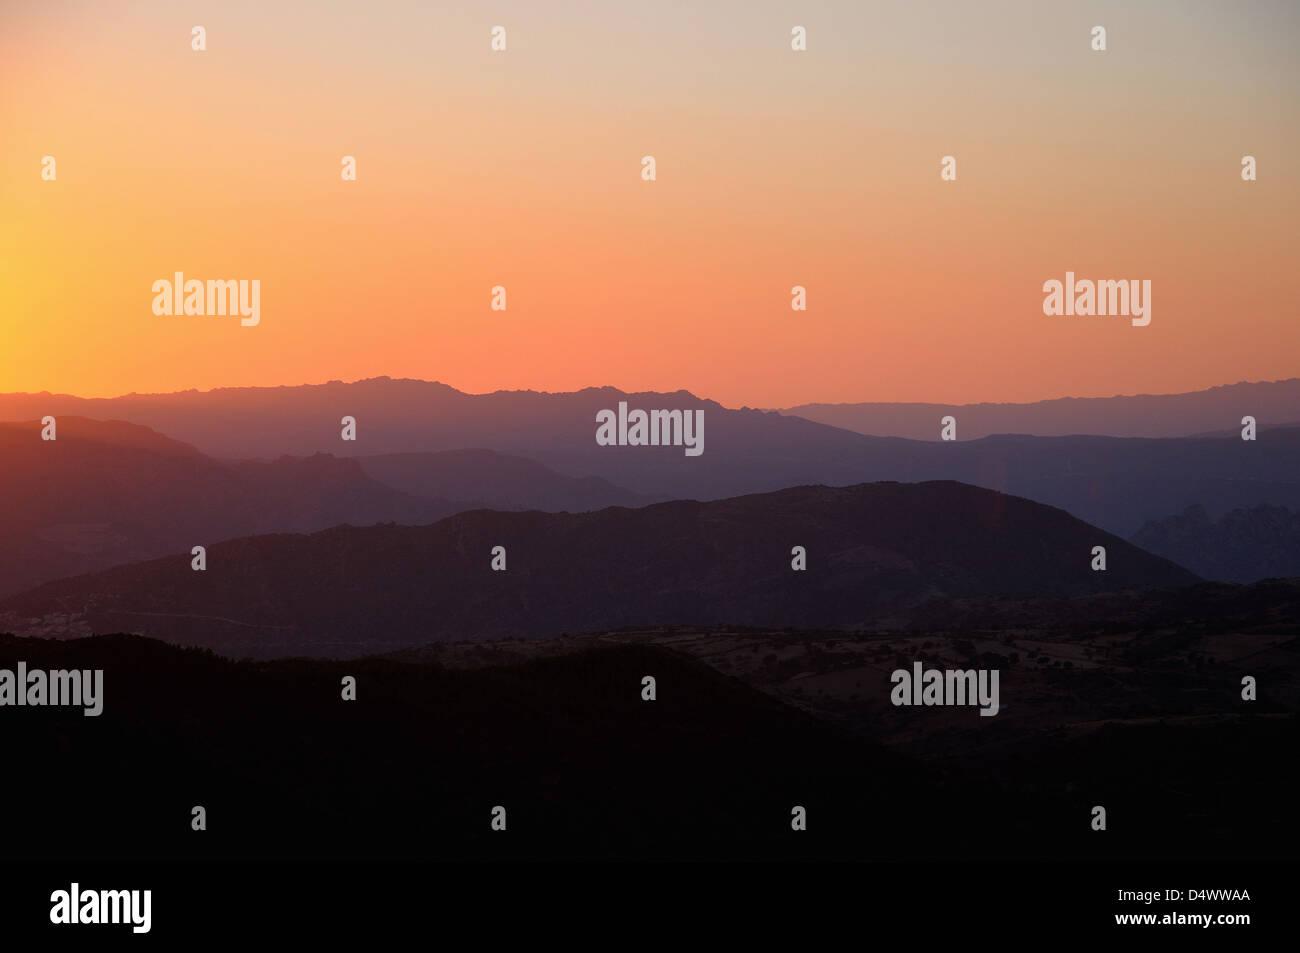 Sardegna Italy Sunset monte albo by andrea quercioli - Stock Image